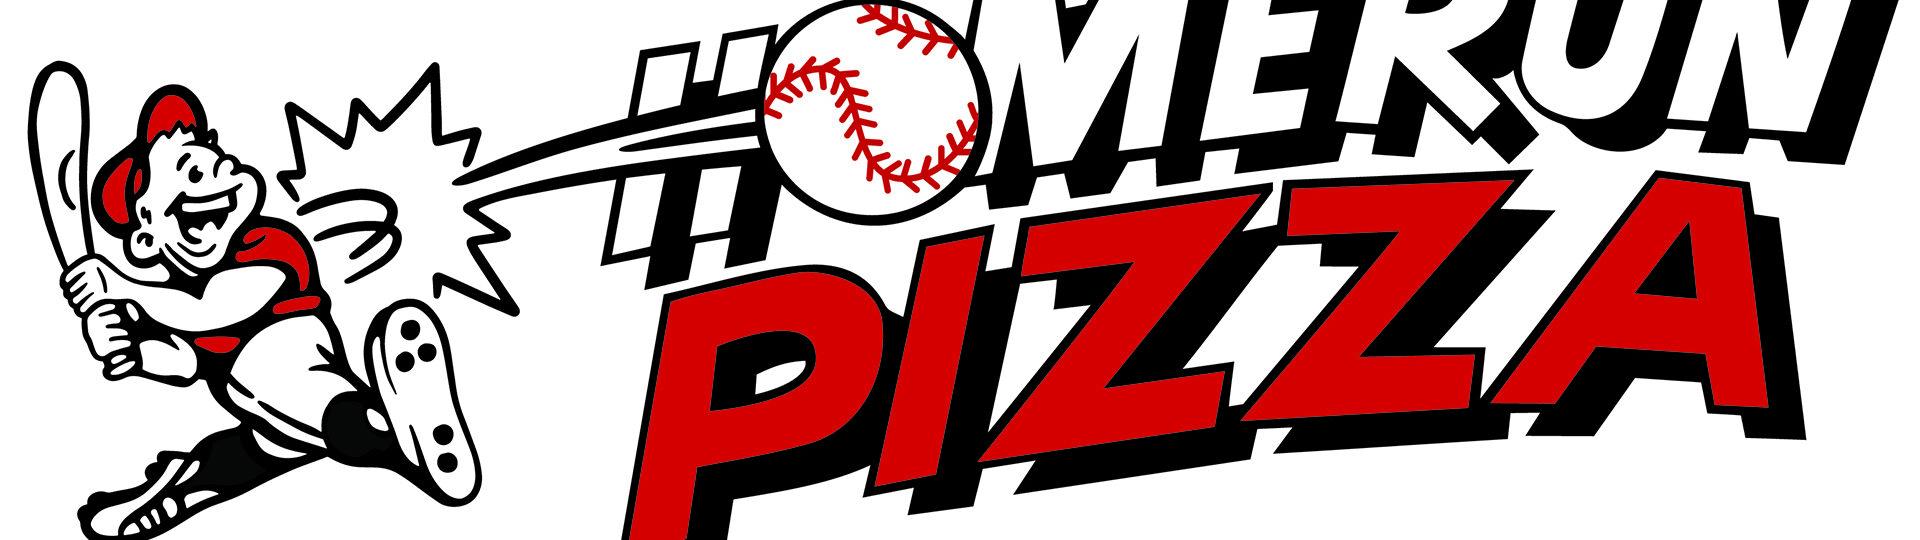 homerun pizza logo